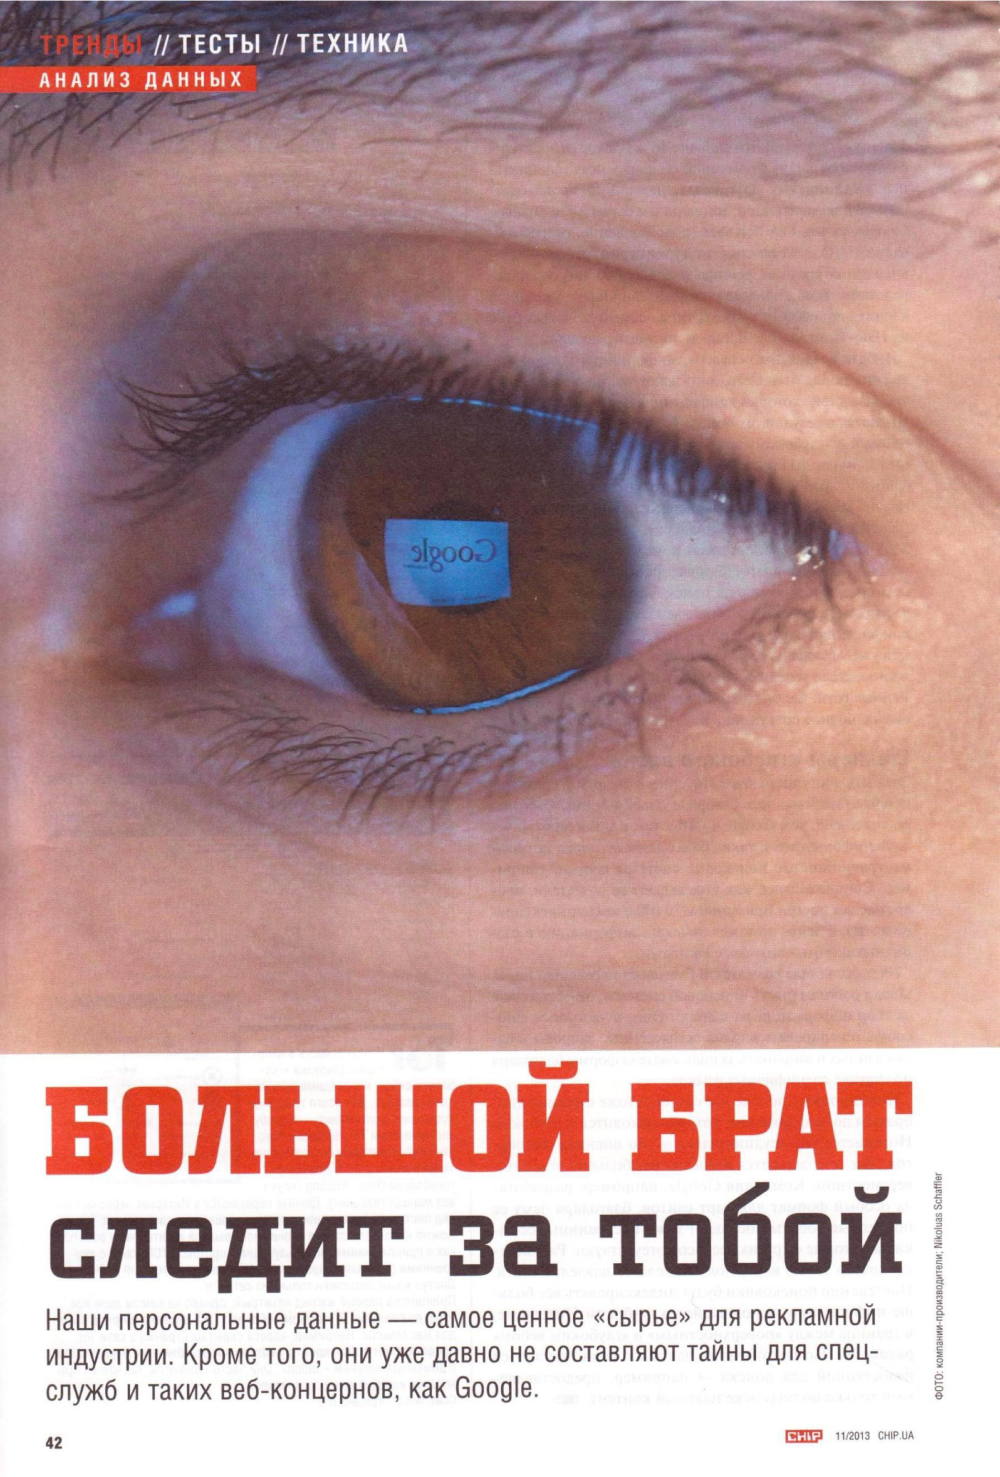 http://i2.imageban.ru/out/2013/11/01/c125b43401d4f99d317f5f814a7bb60b.jpg